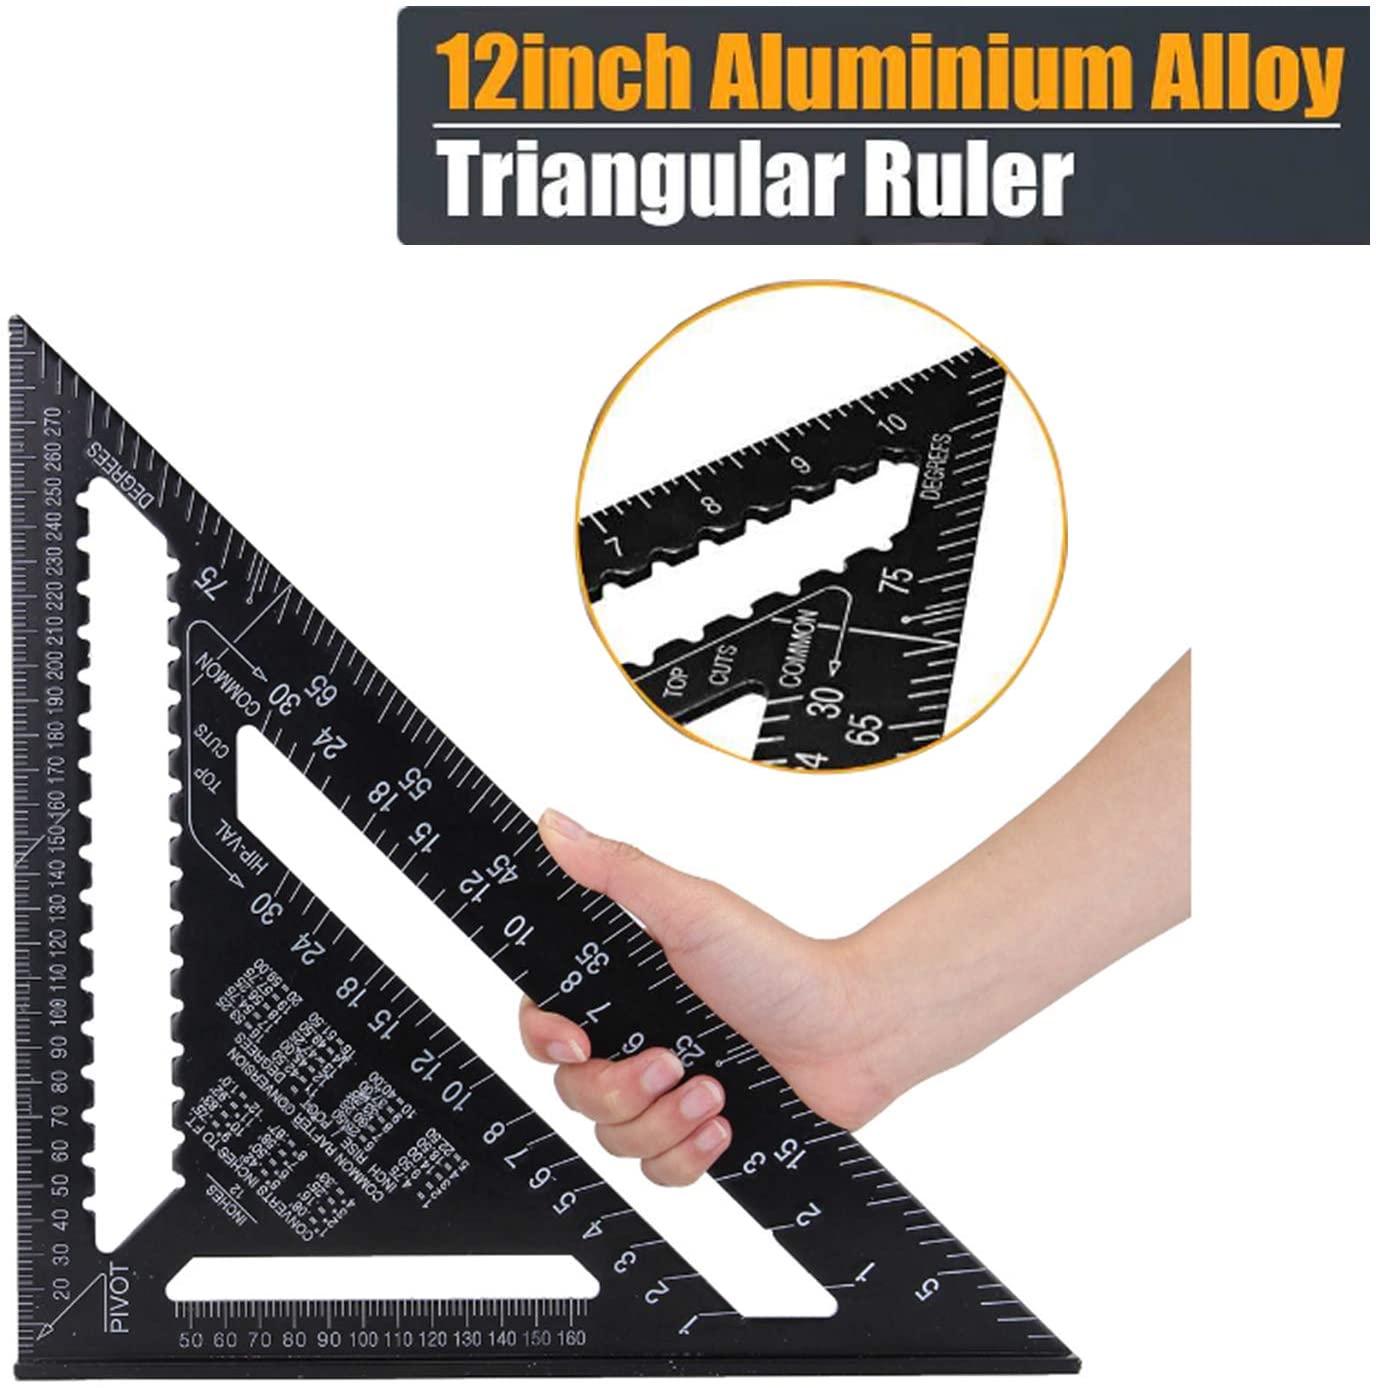 18/30cm Aluminium Set Square ruler 12inch Protractors Rafter Angle Frame Measuring Carpenter Measurement woodworking Triangular Ruler (12inch)